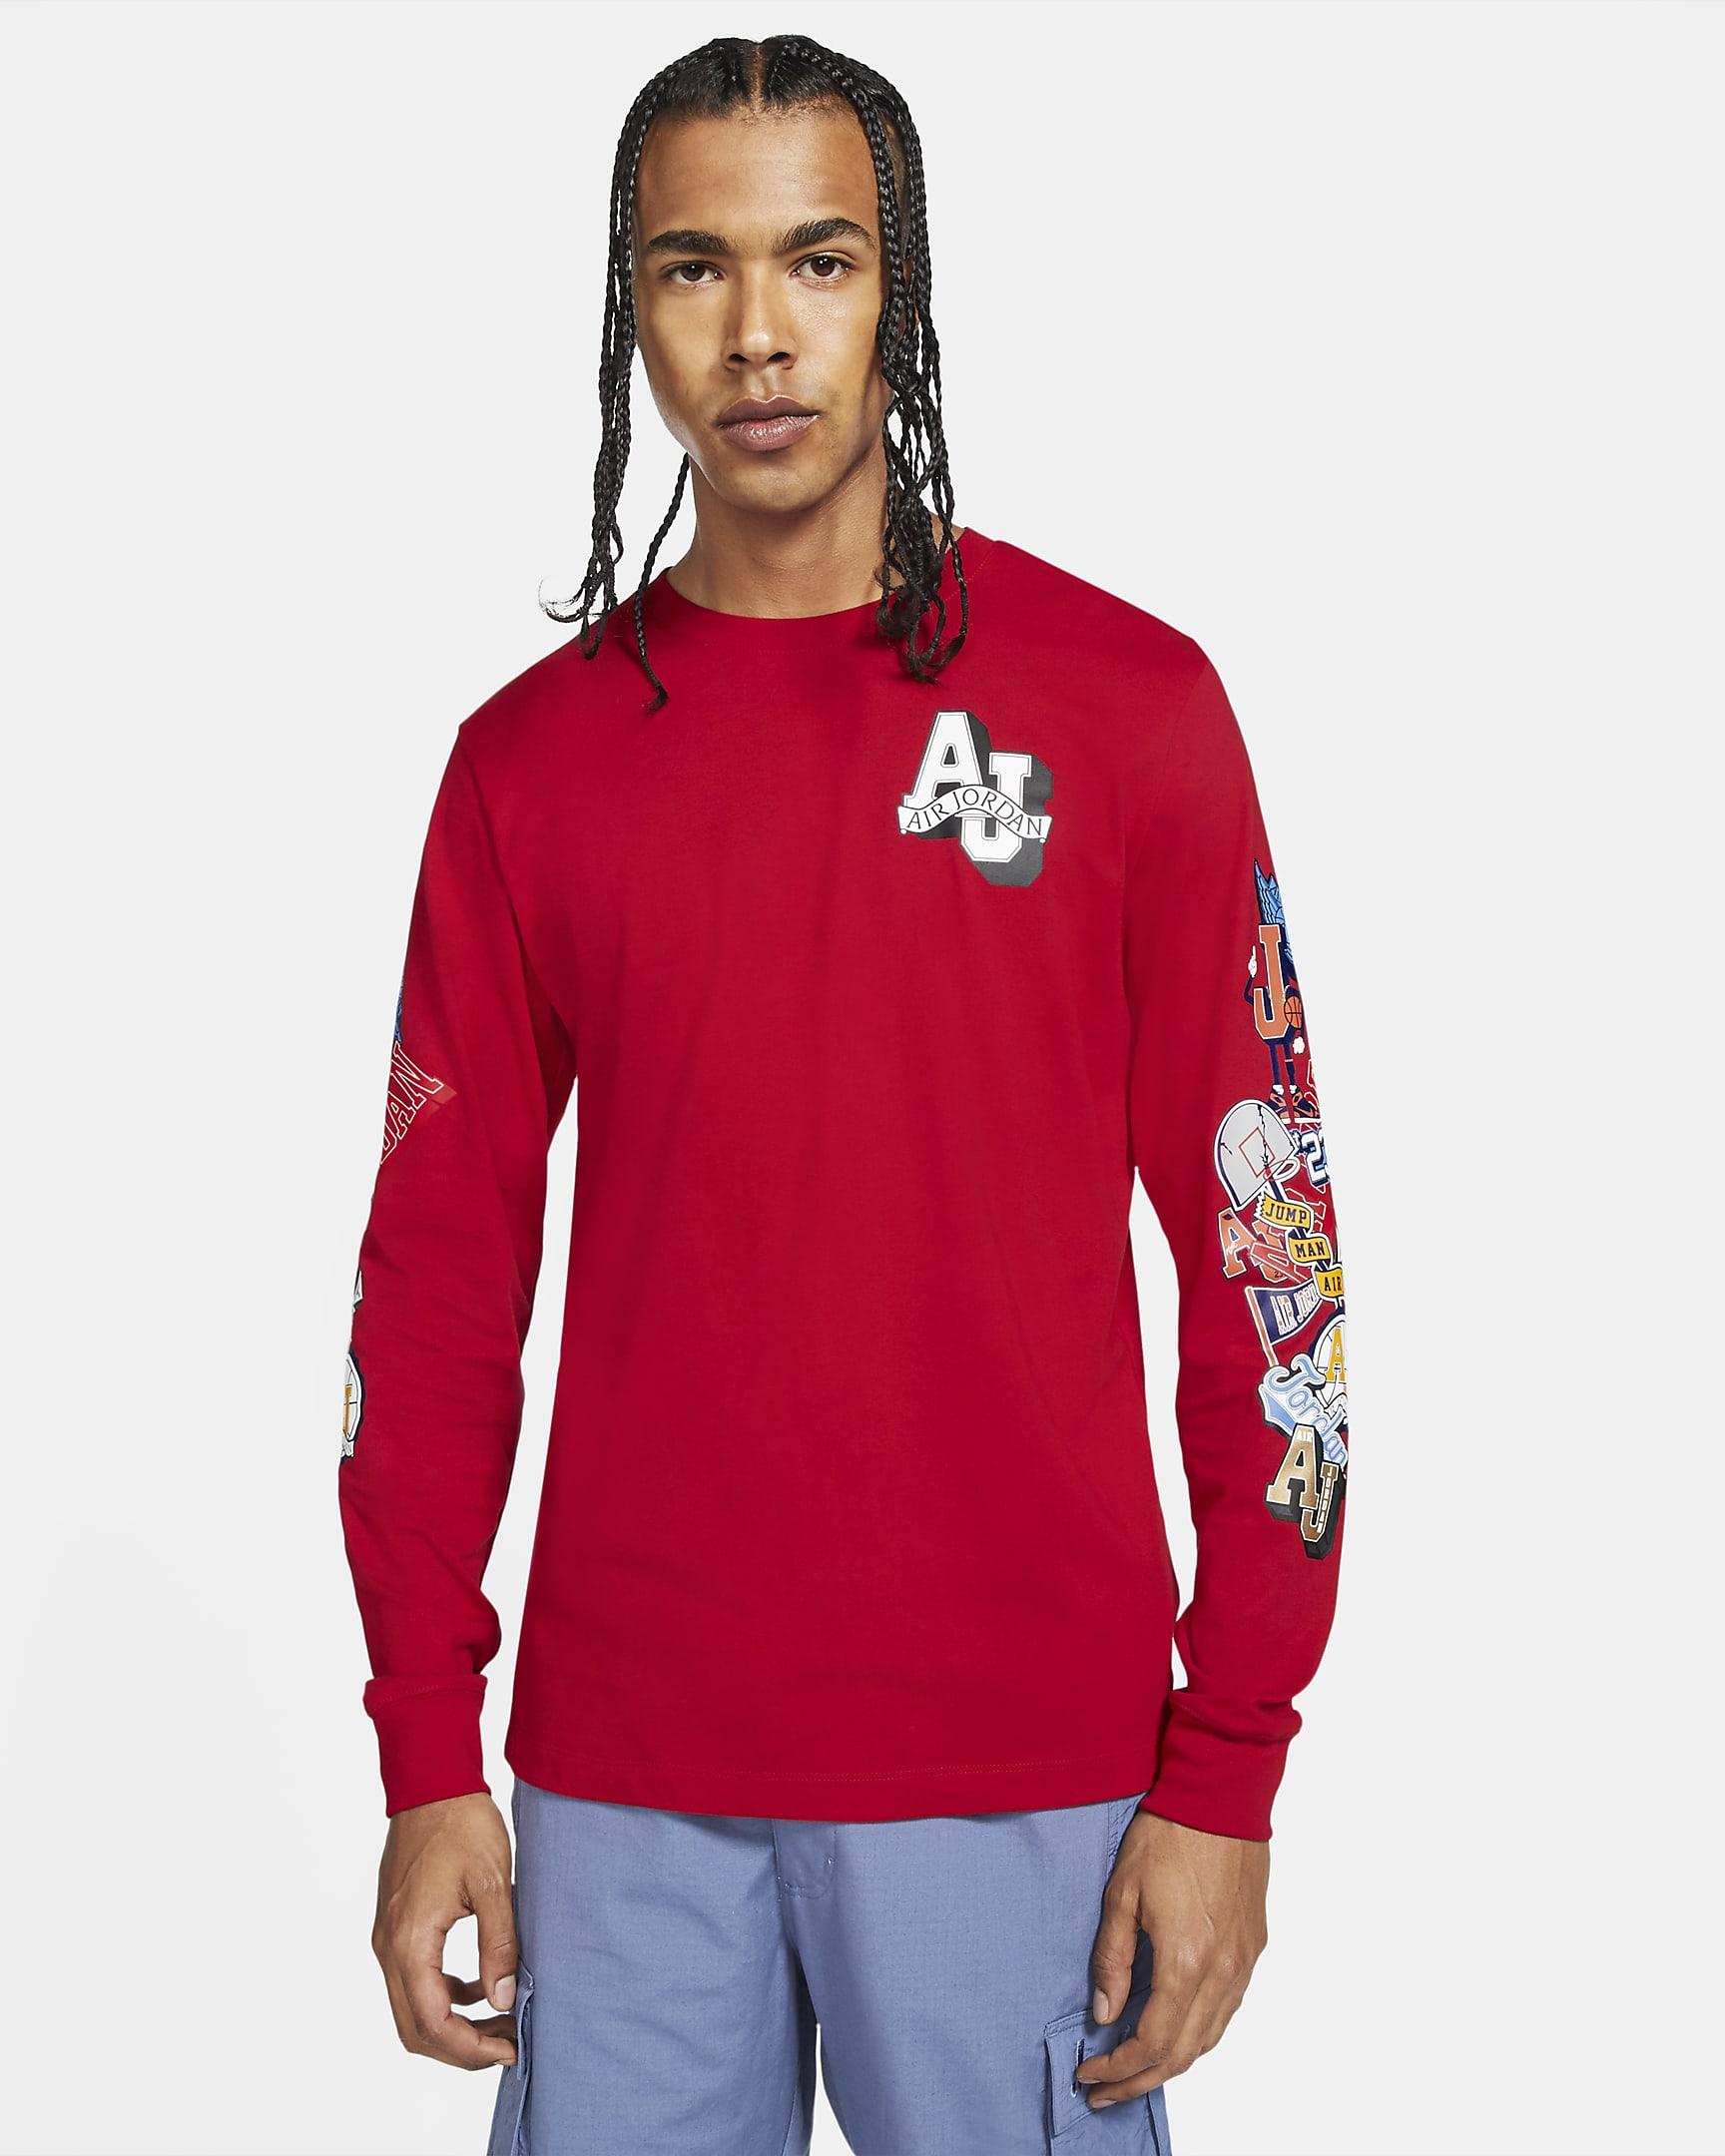 jordan-varsity-mens-long-sleeve-t-shirt-4vZsx0-1